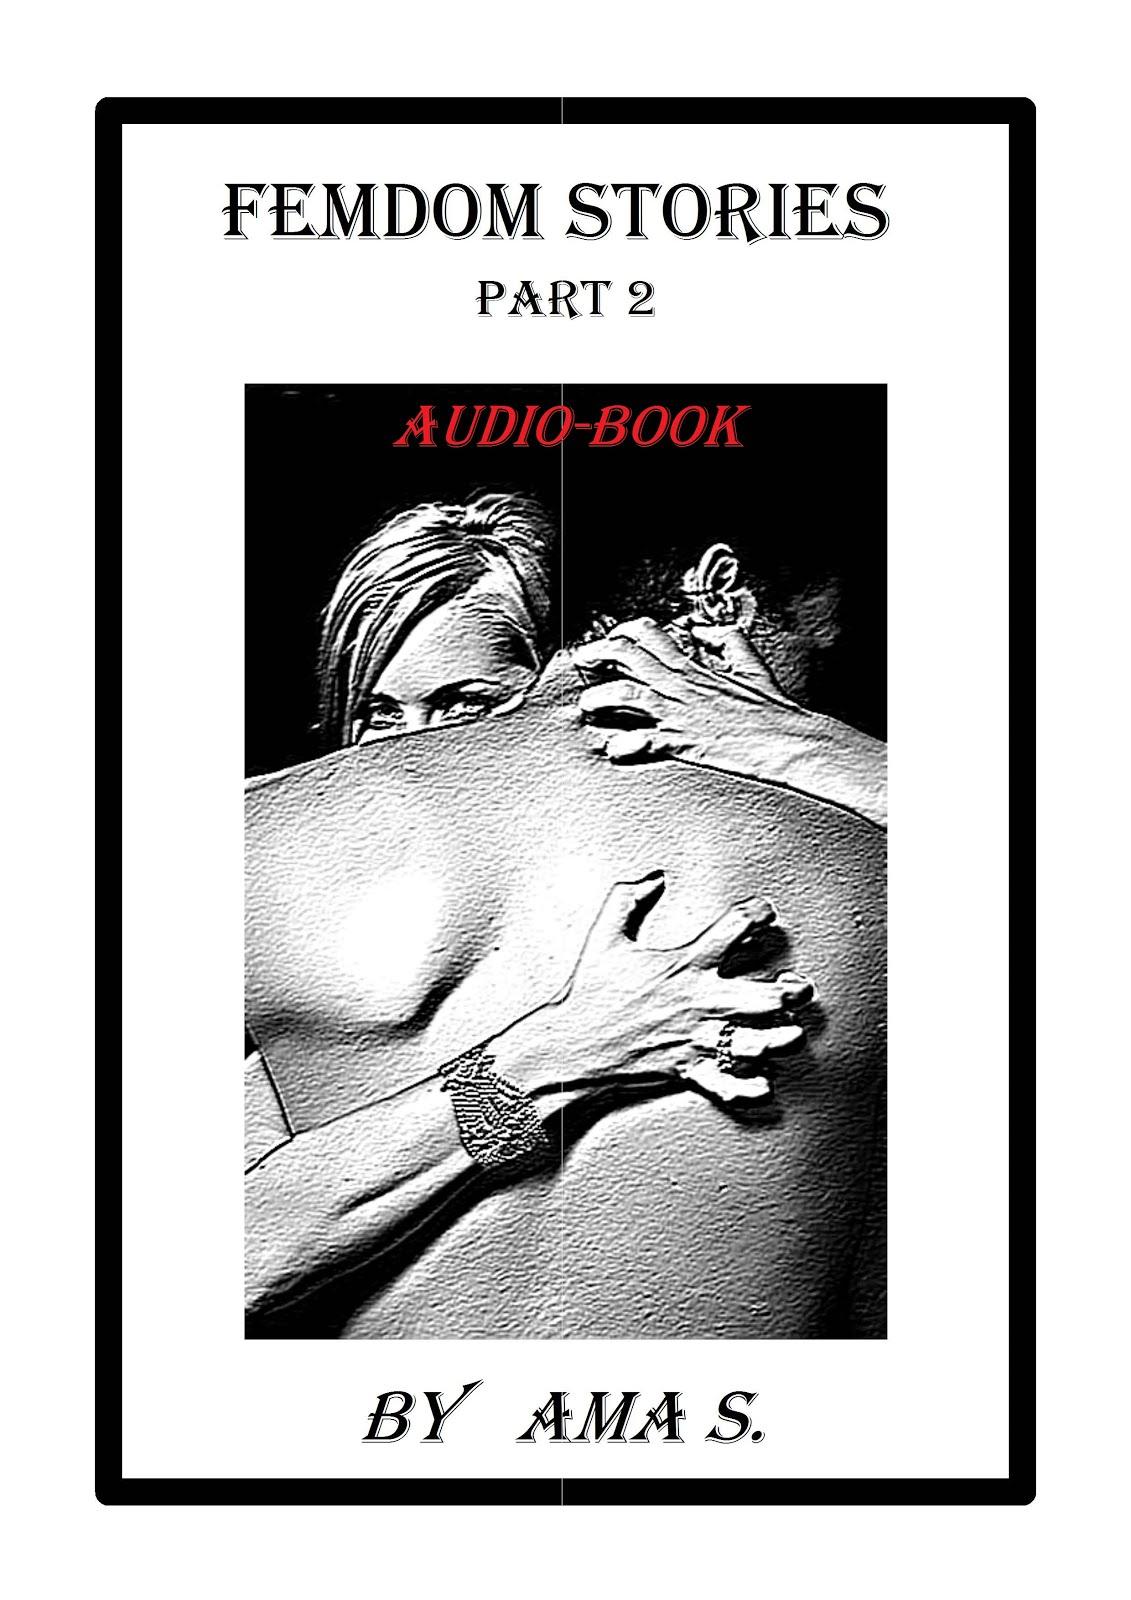 FEMDOM STORIES 2. AUDIO-BOOK